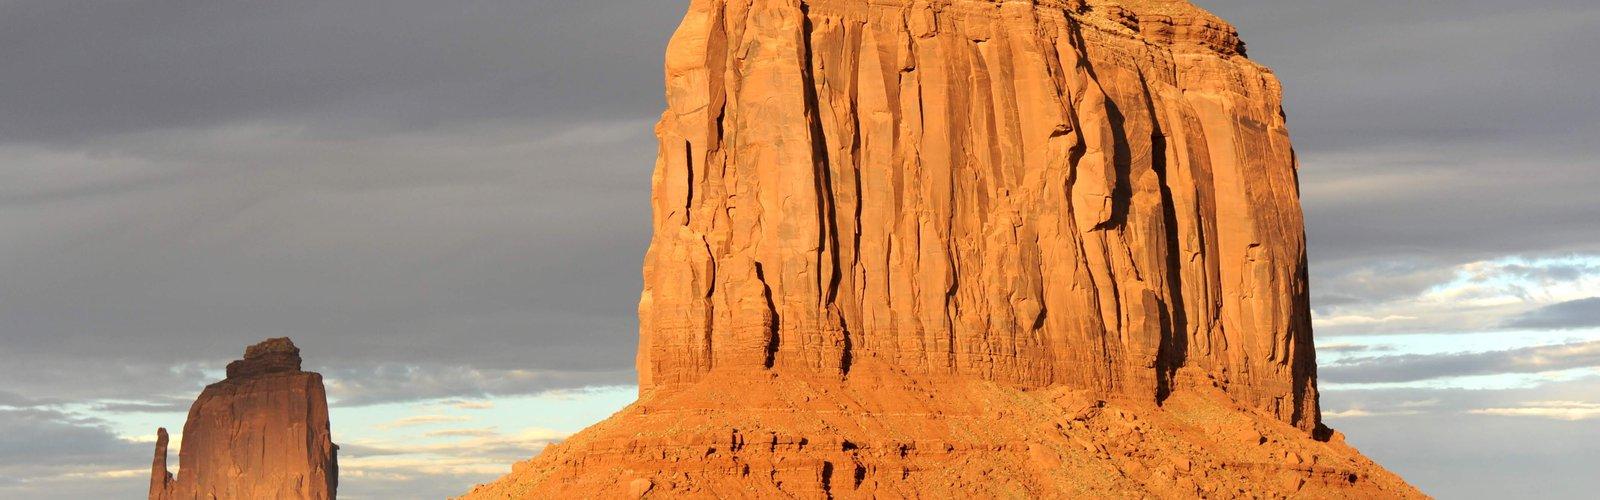 Monument Valley AZ UT